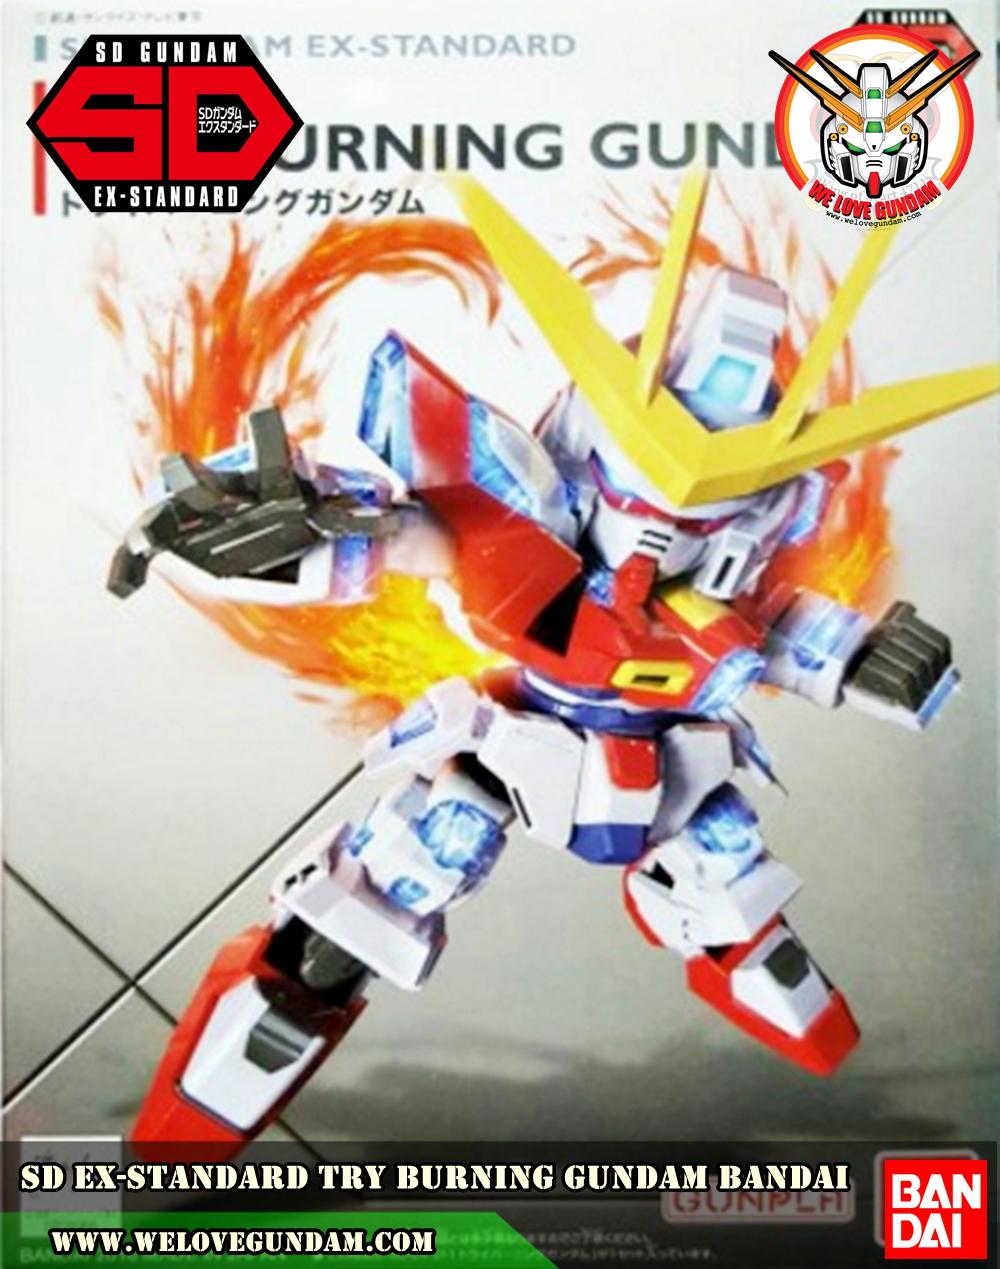 SD EX-STANDARD 011 TRY BURNING GUNDAM